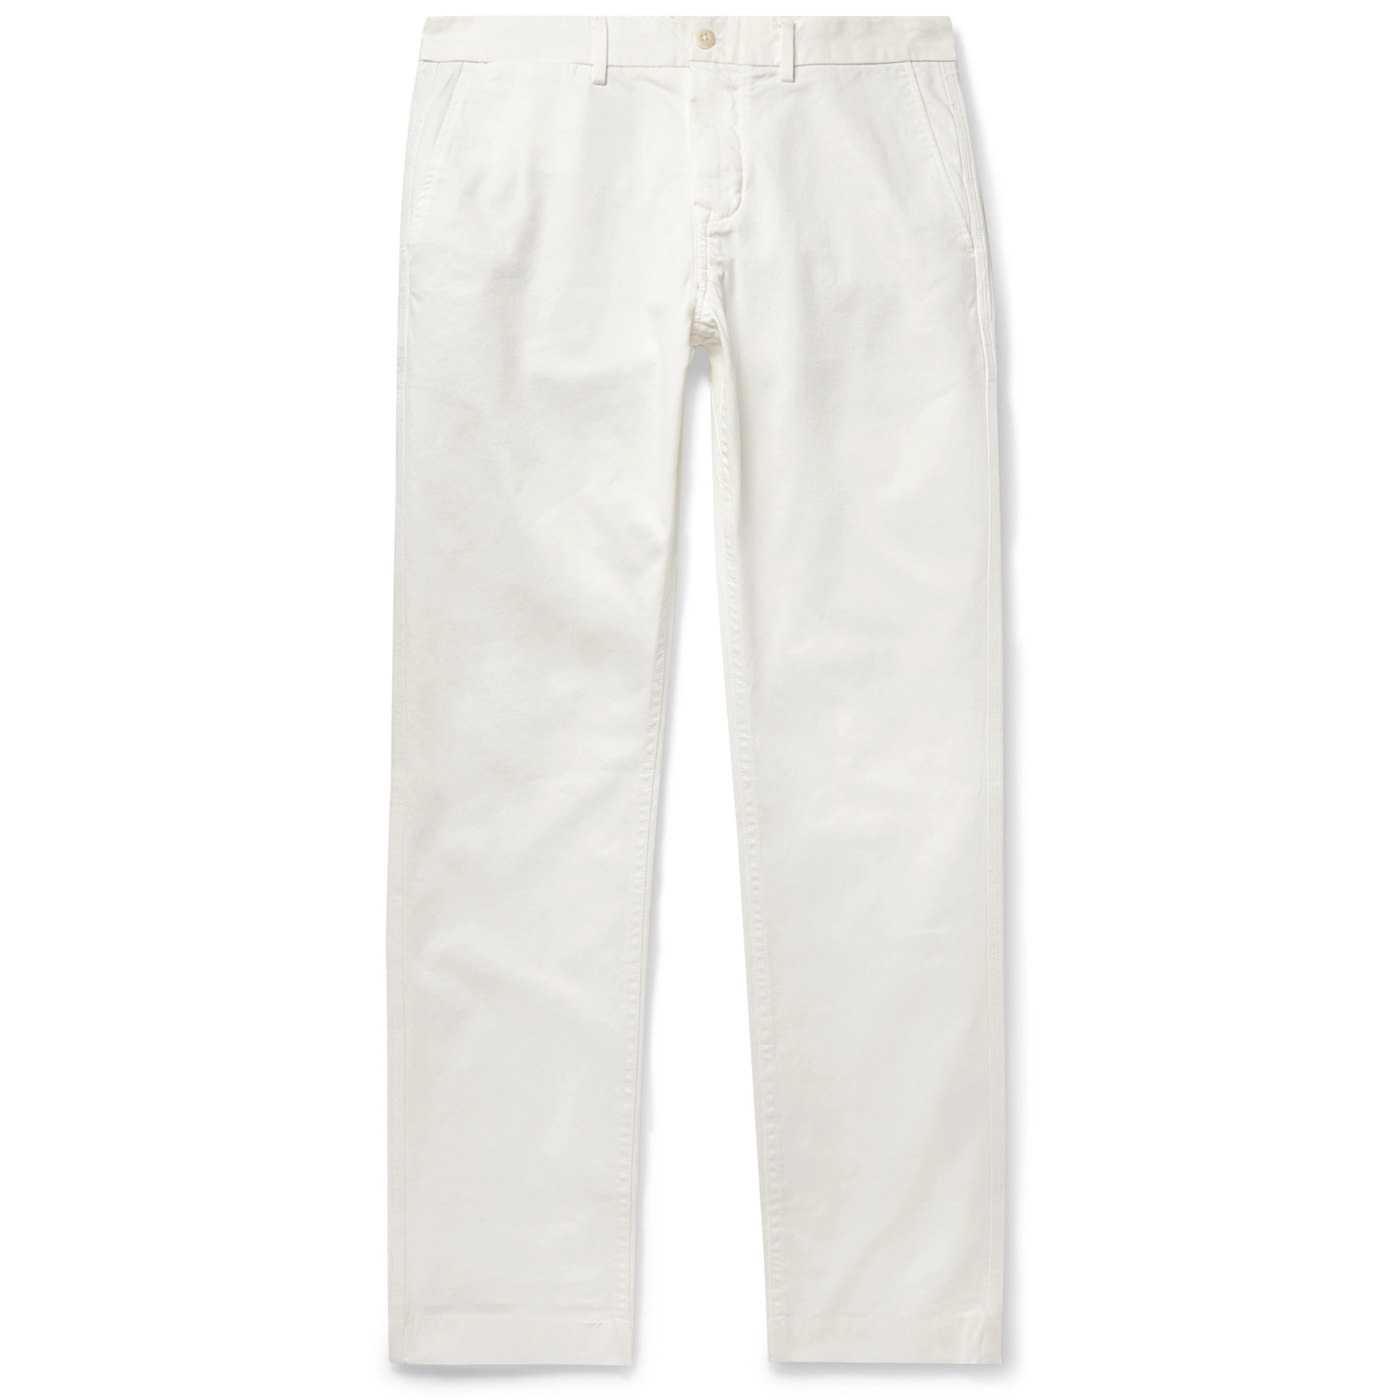 Style Mr Porter Pantalon Alex Mill Chinos